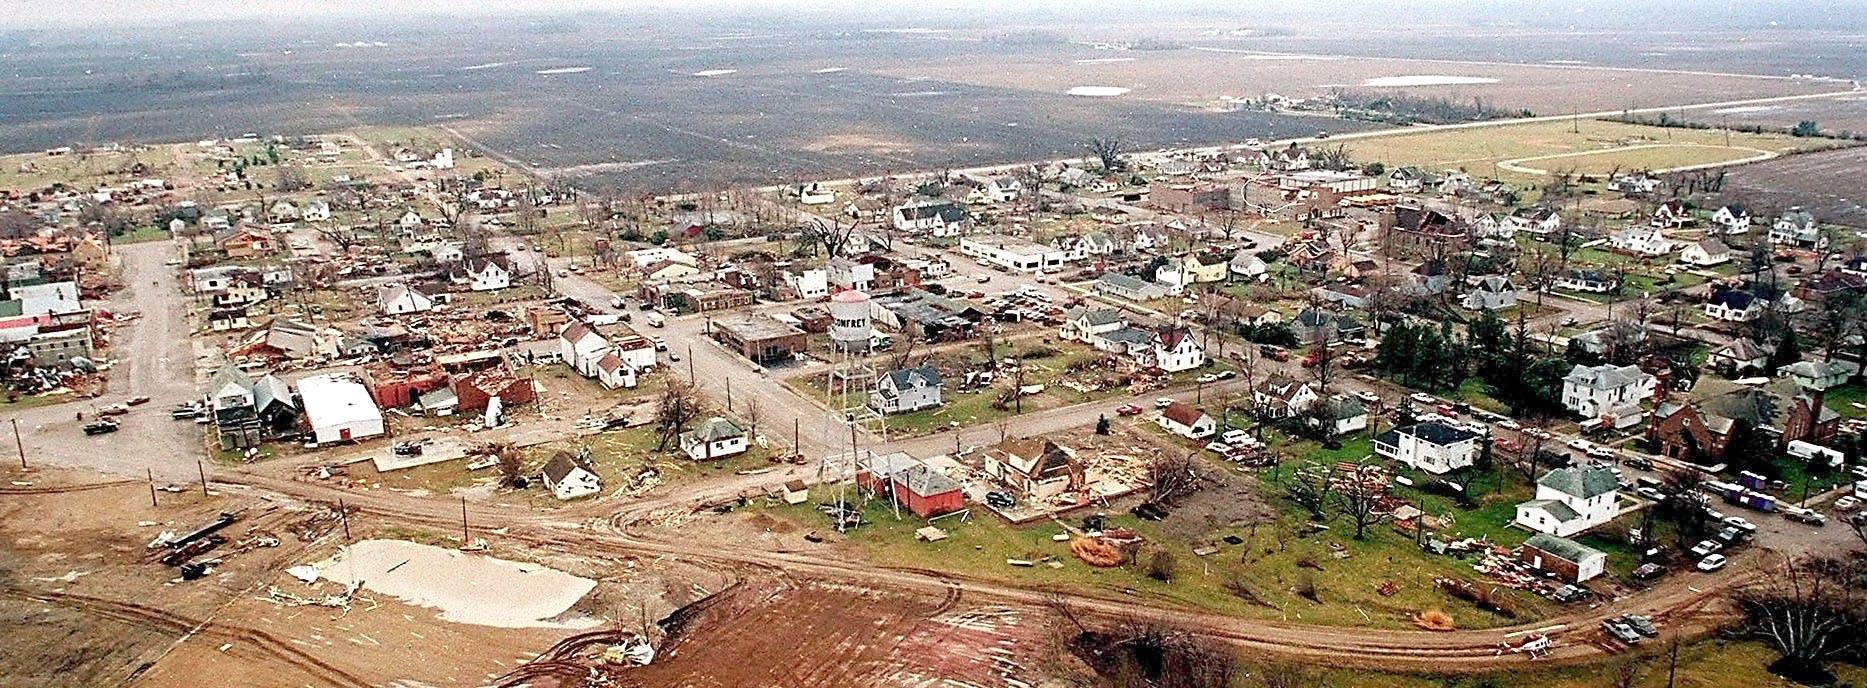 A March 30, 1998 aerial view of Comfrey, Minn.